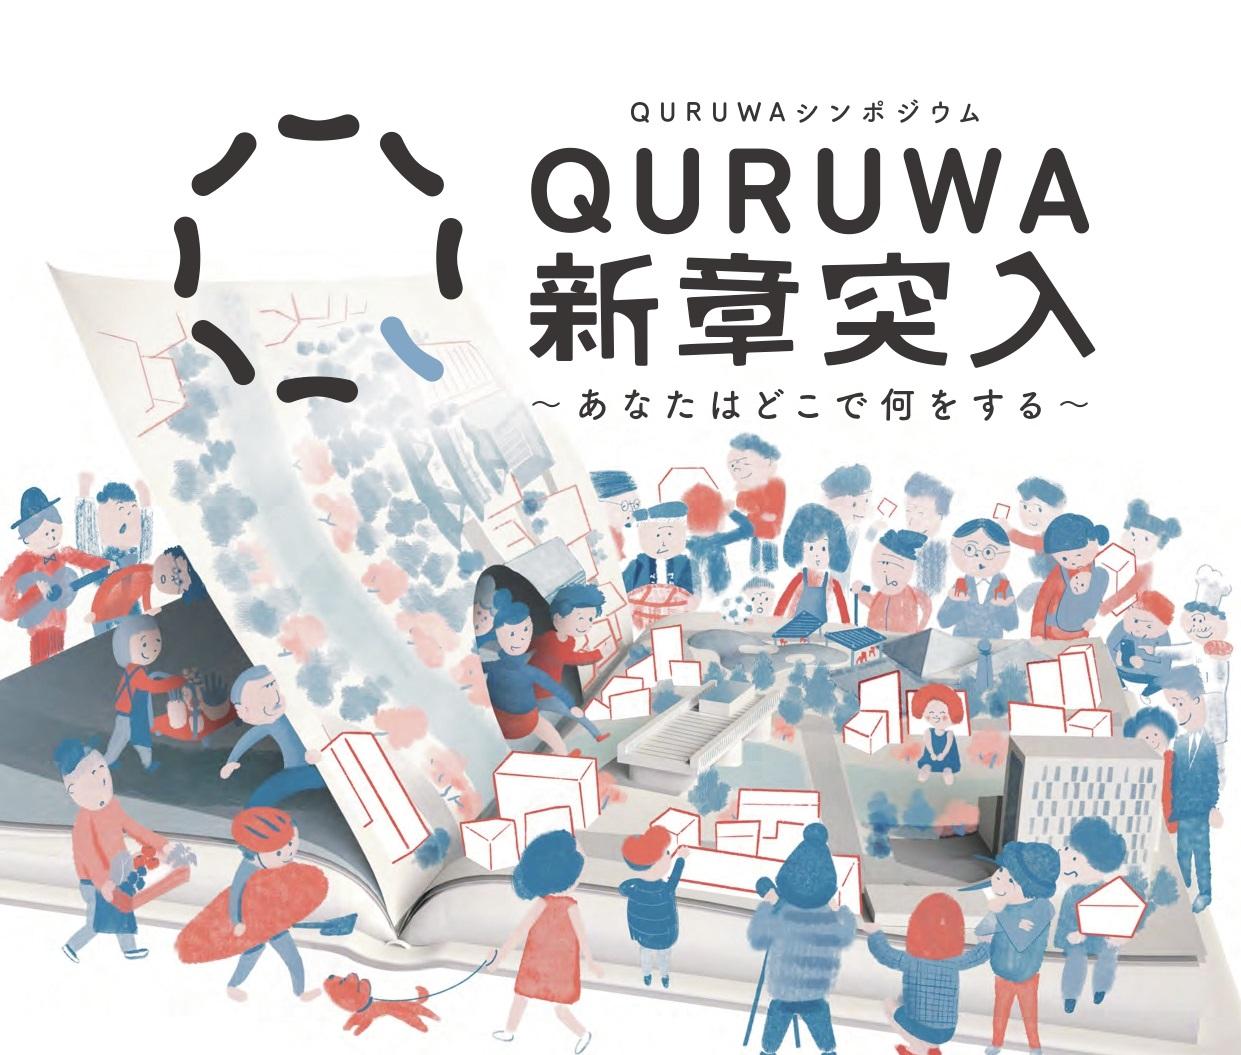 QURUWAシンポジウム「QURUWA新章突入~あなたはどこで何をする~」